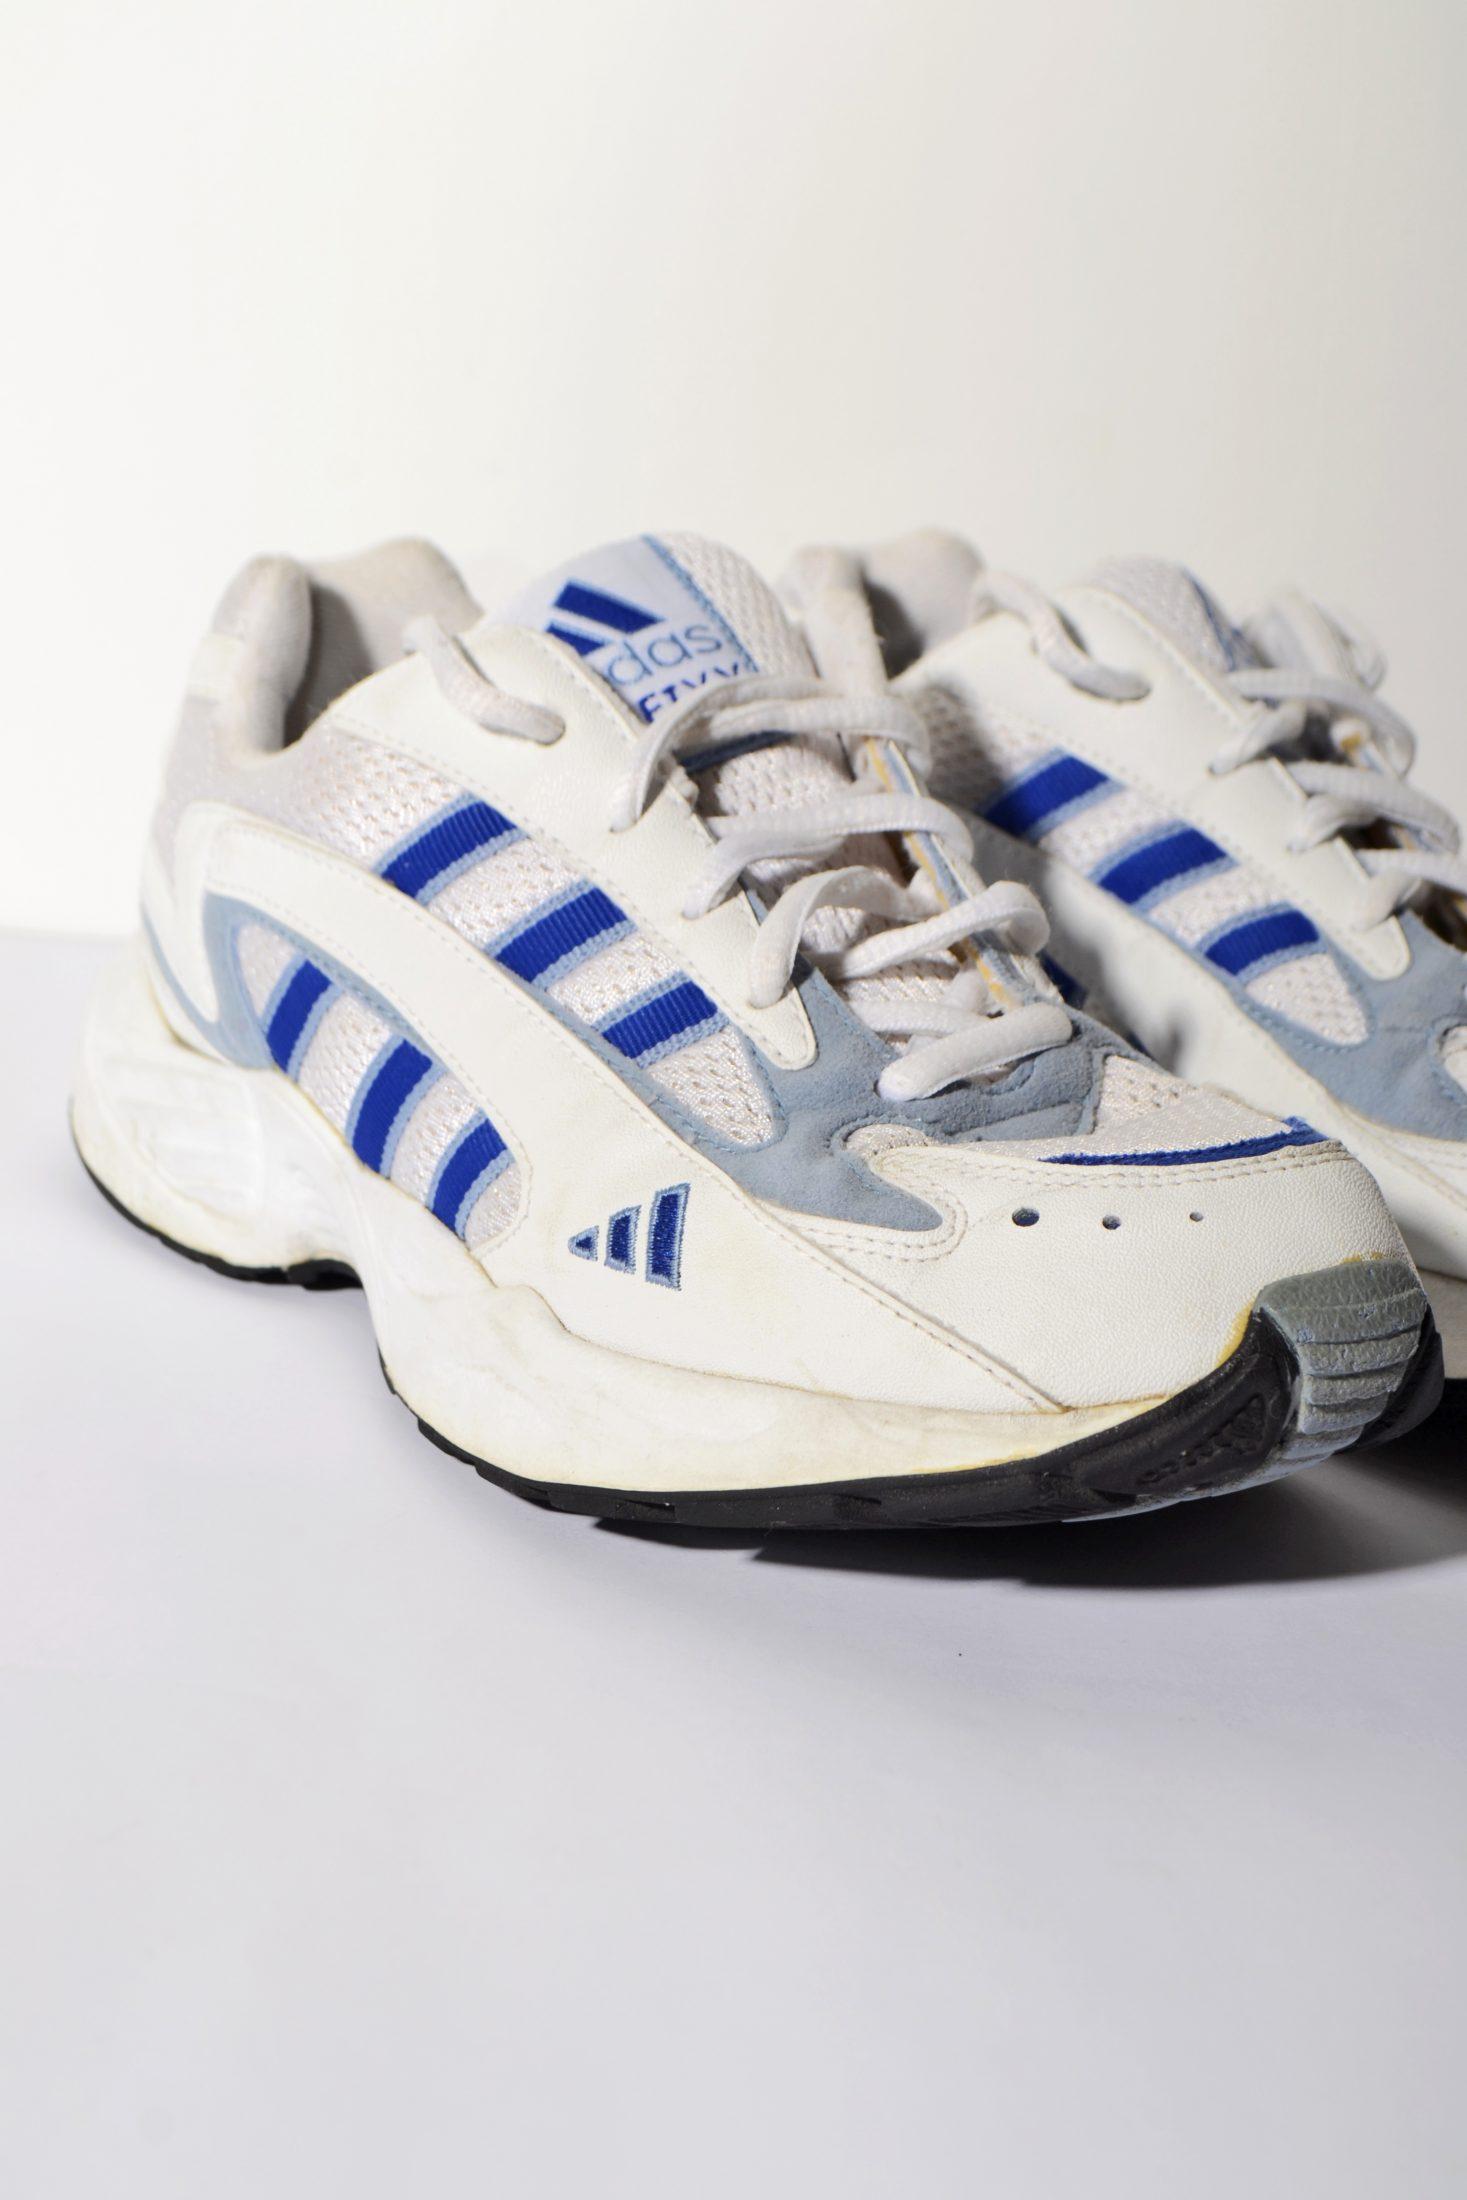 adidas school trainers